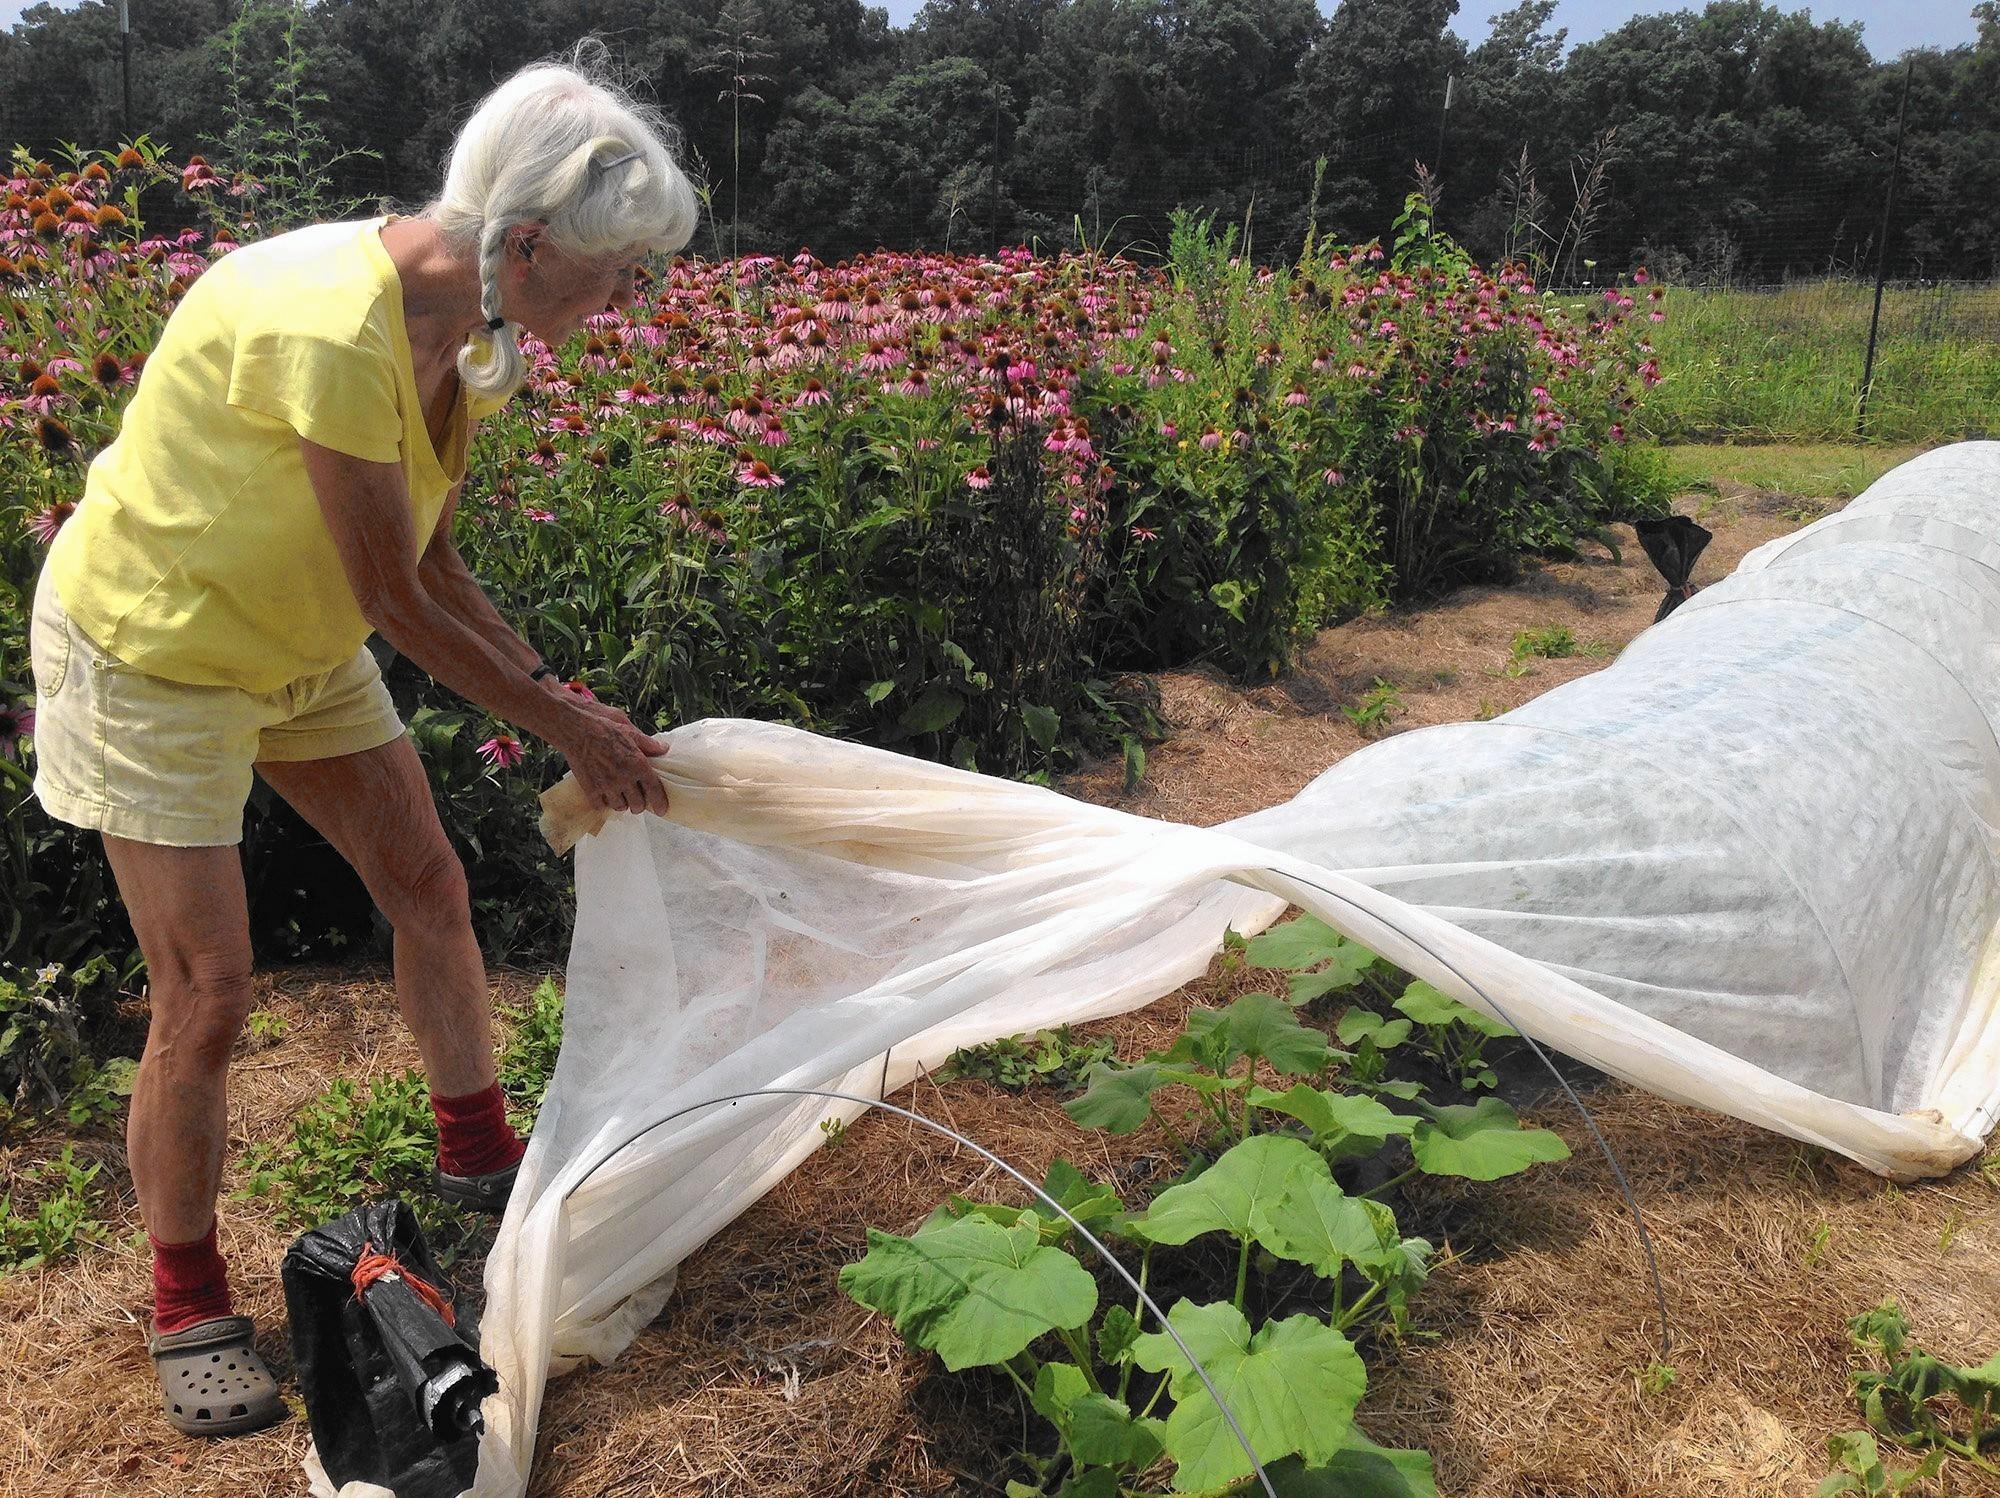 Gardening: Why Butternut Squash Plants Arenu0027t Producing Fruit